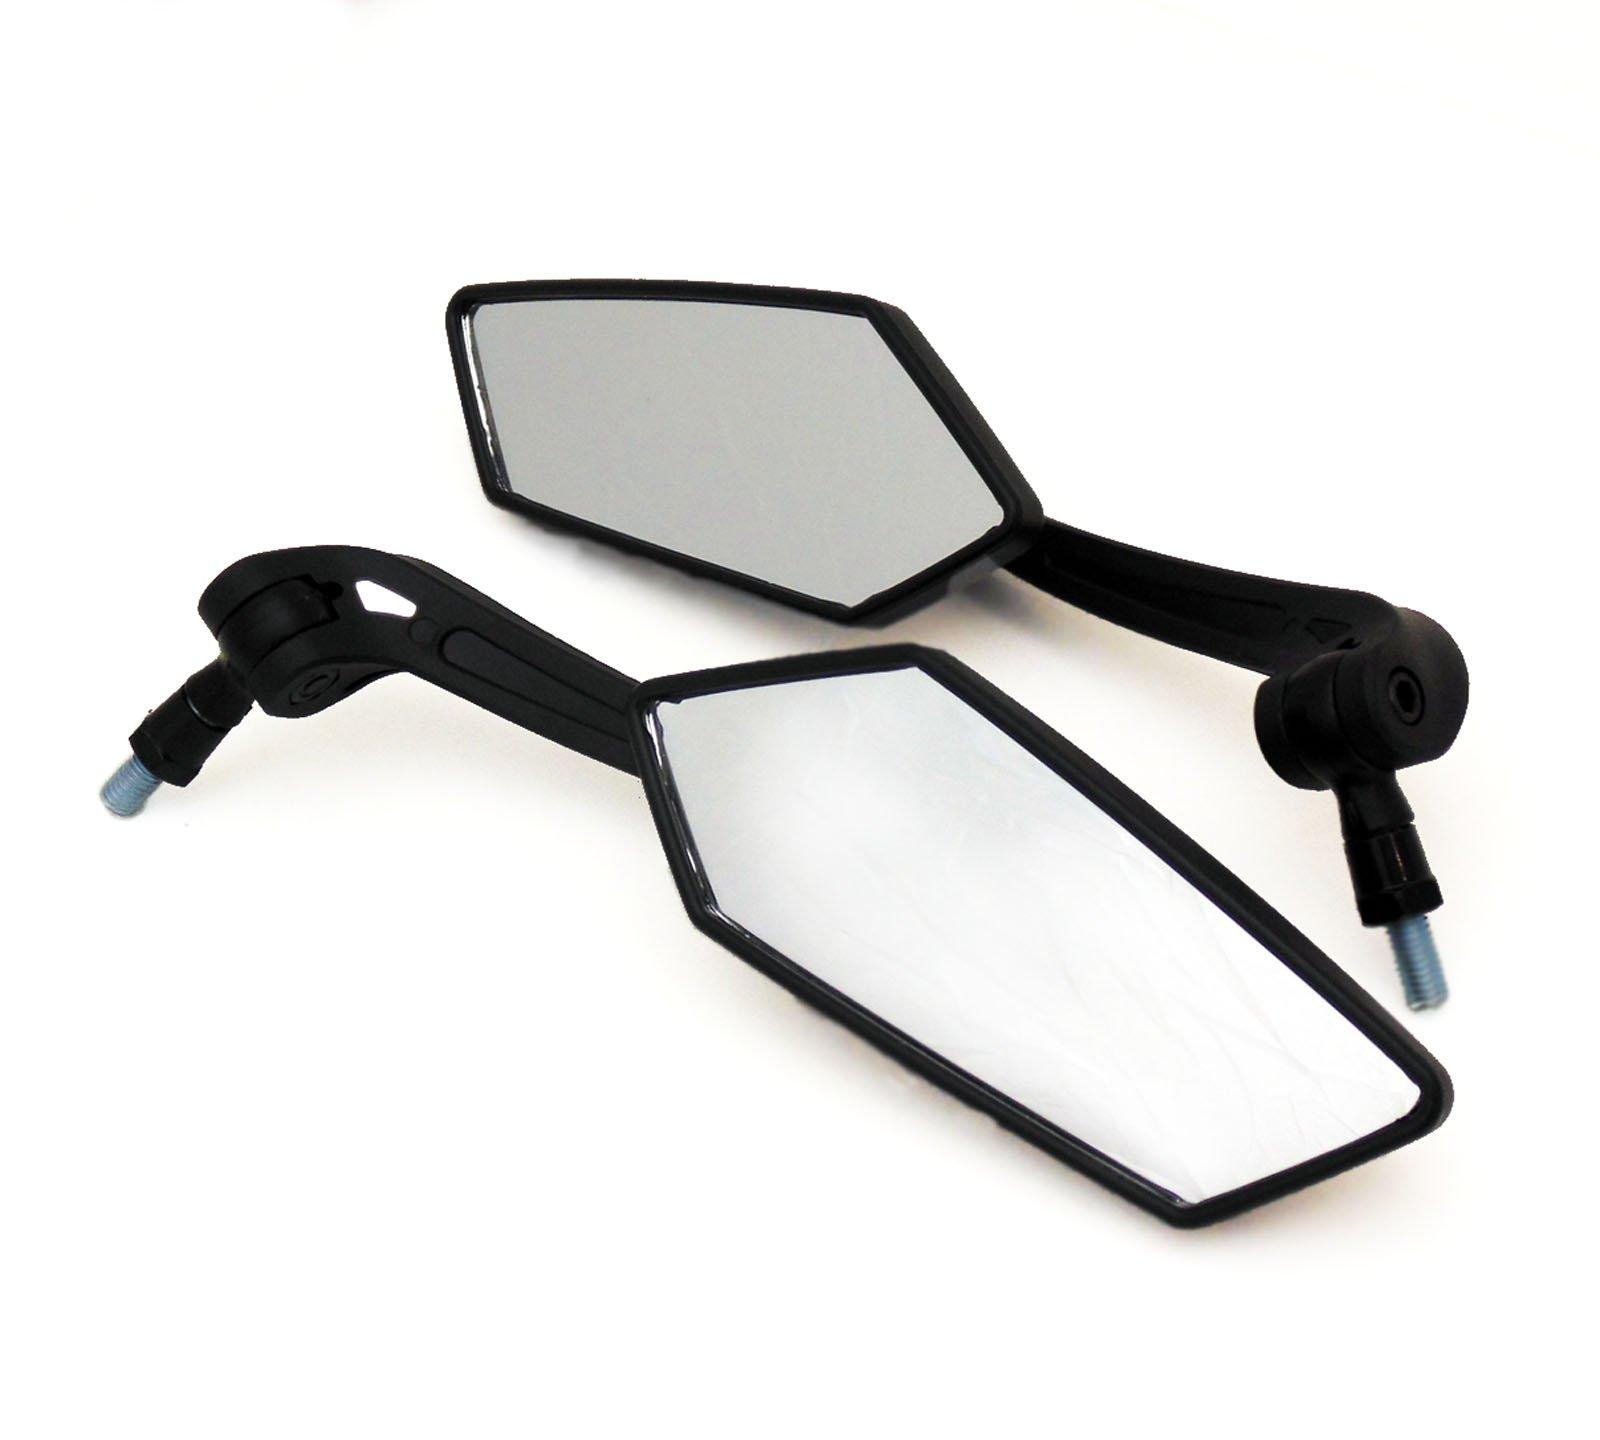 Universal Fit Adjustable Mirror Set - 8mm RH/RH Thread - Flat Black - Motorcycle Scooter (4238)